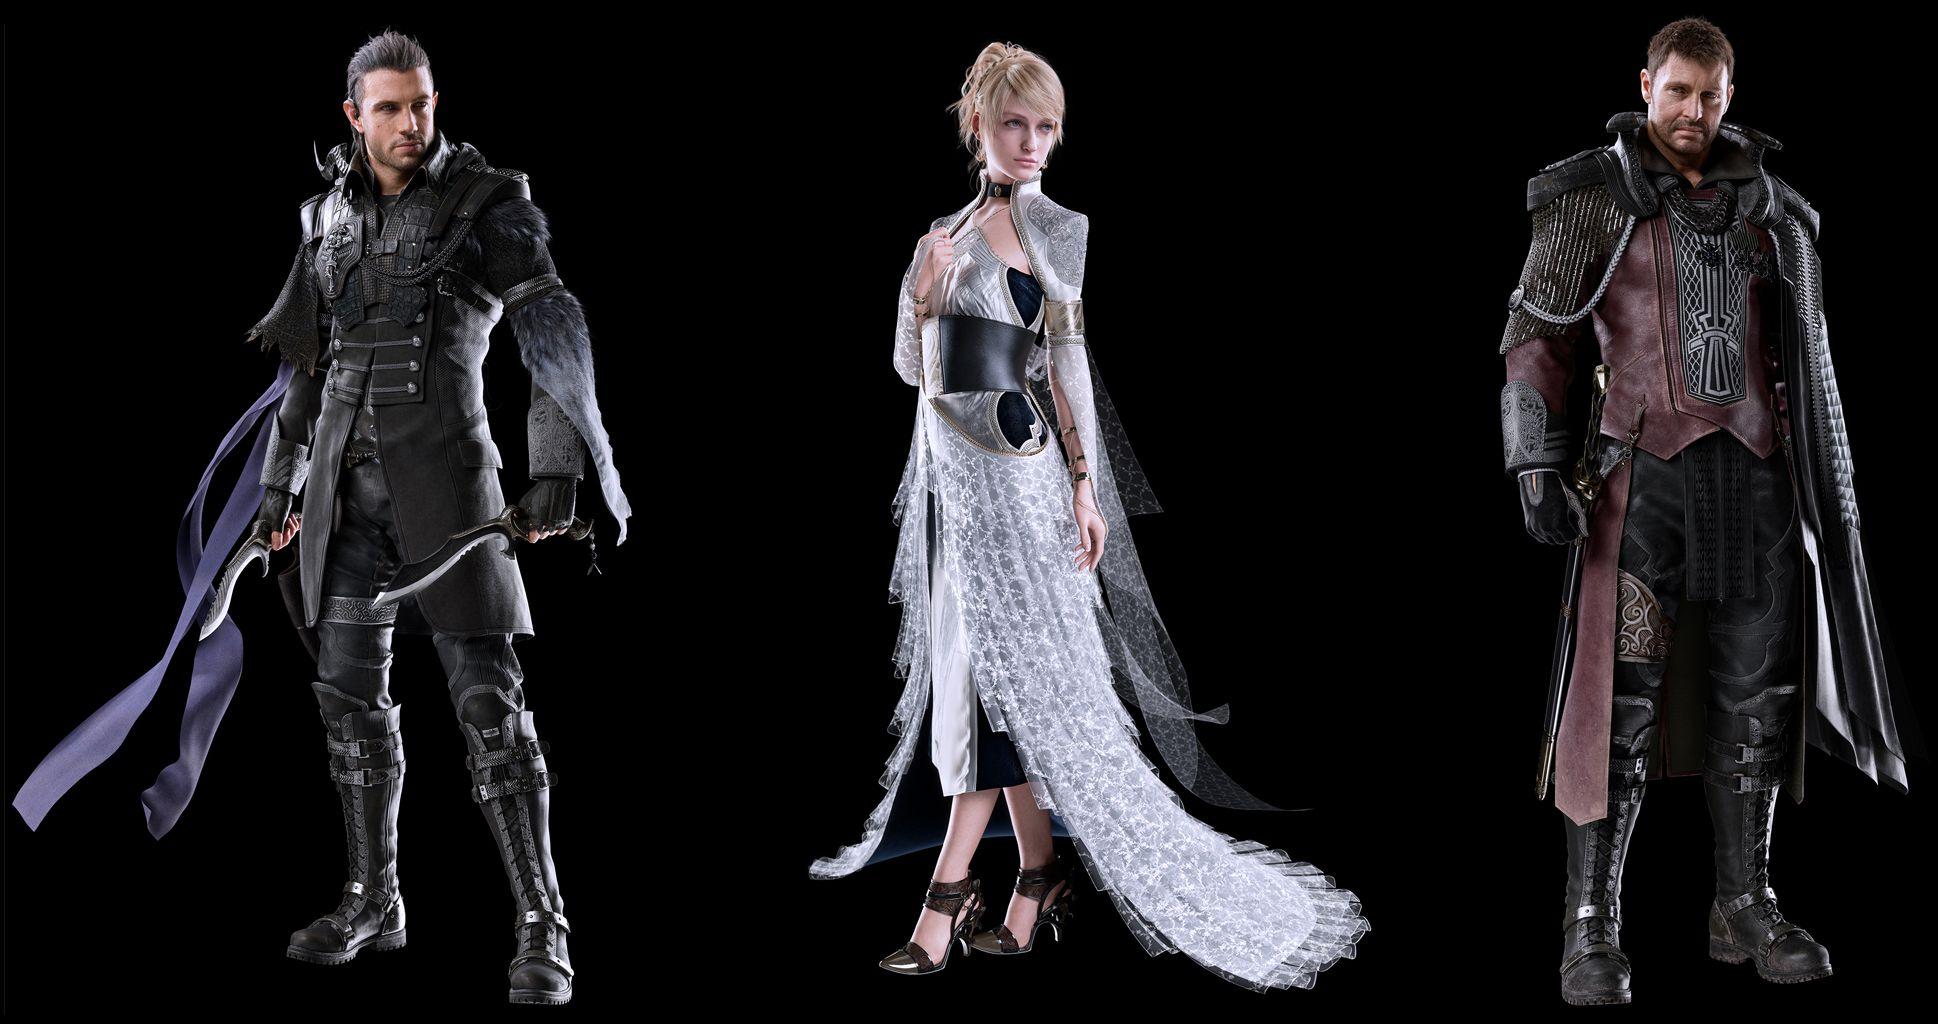 Character Design Final Fantasy Xv : Kingsglaive final fantasy xv character renders g